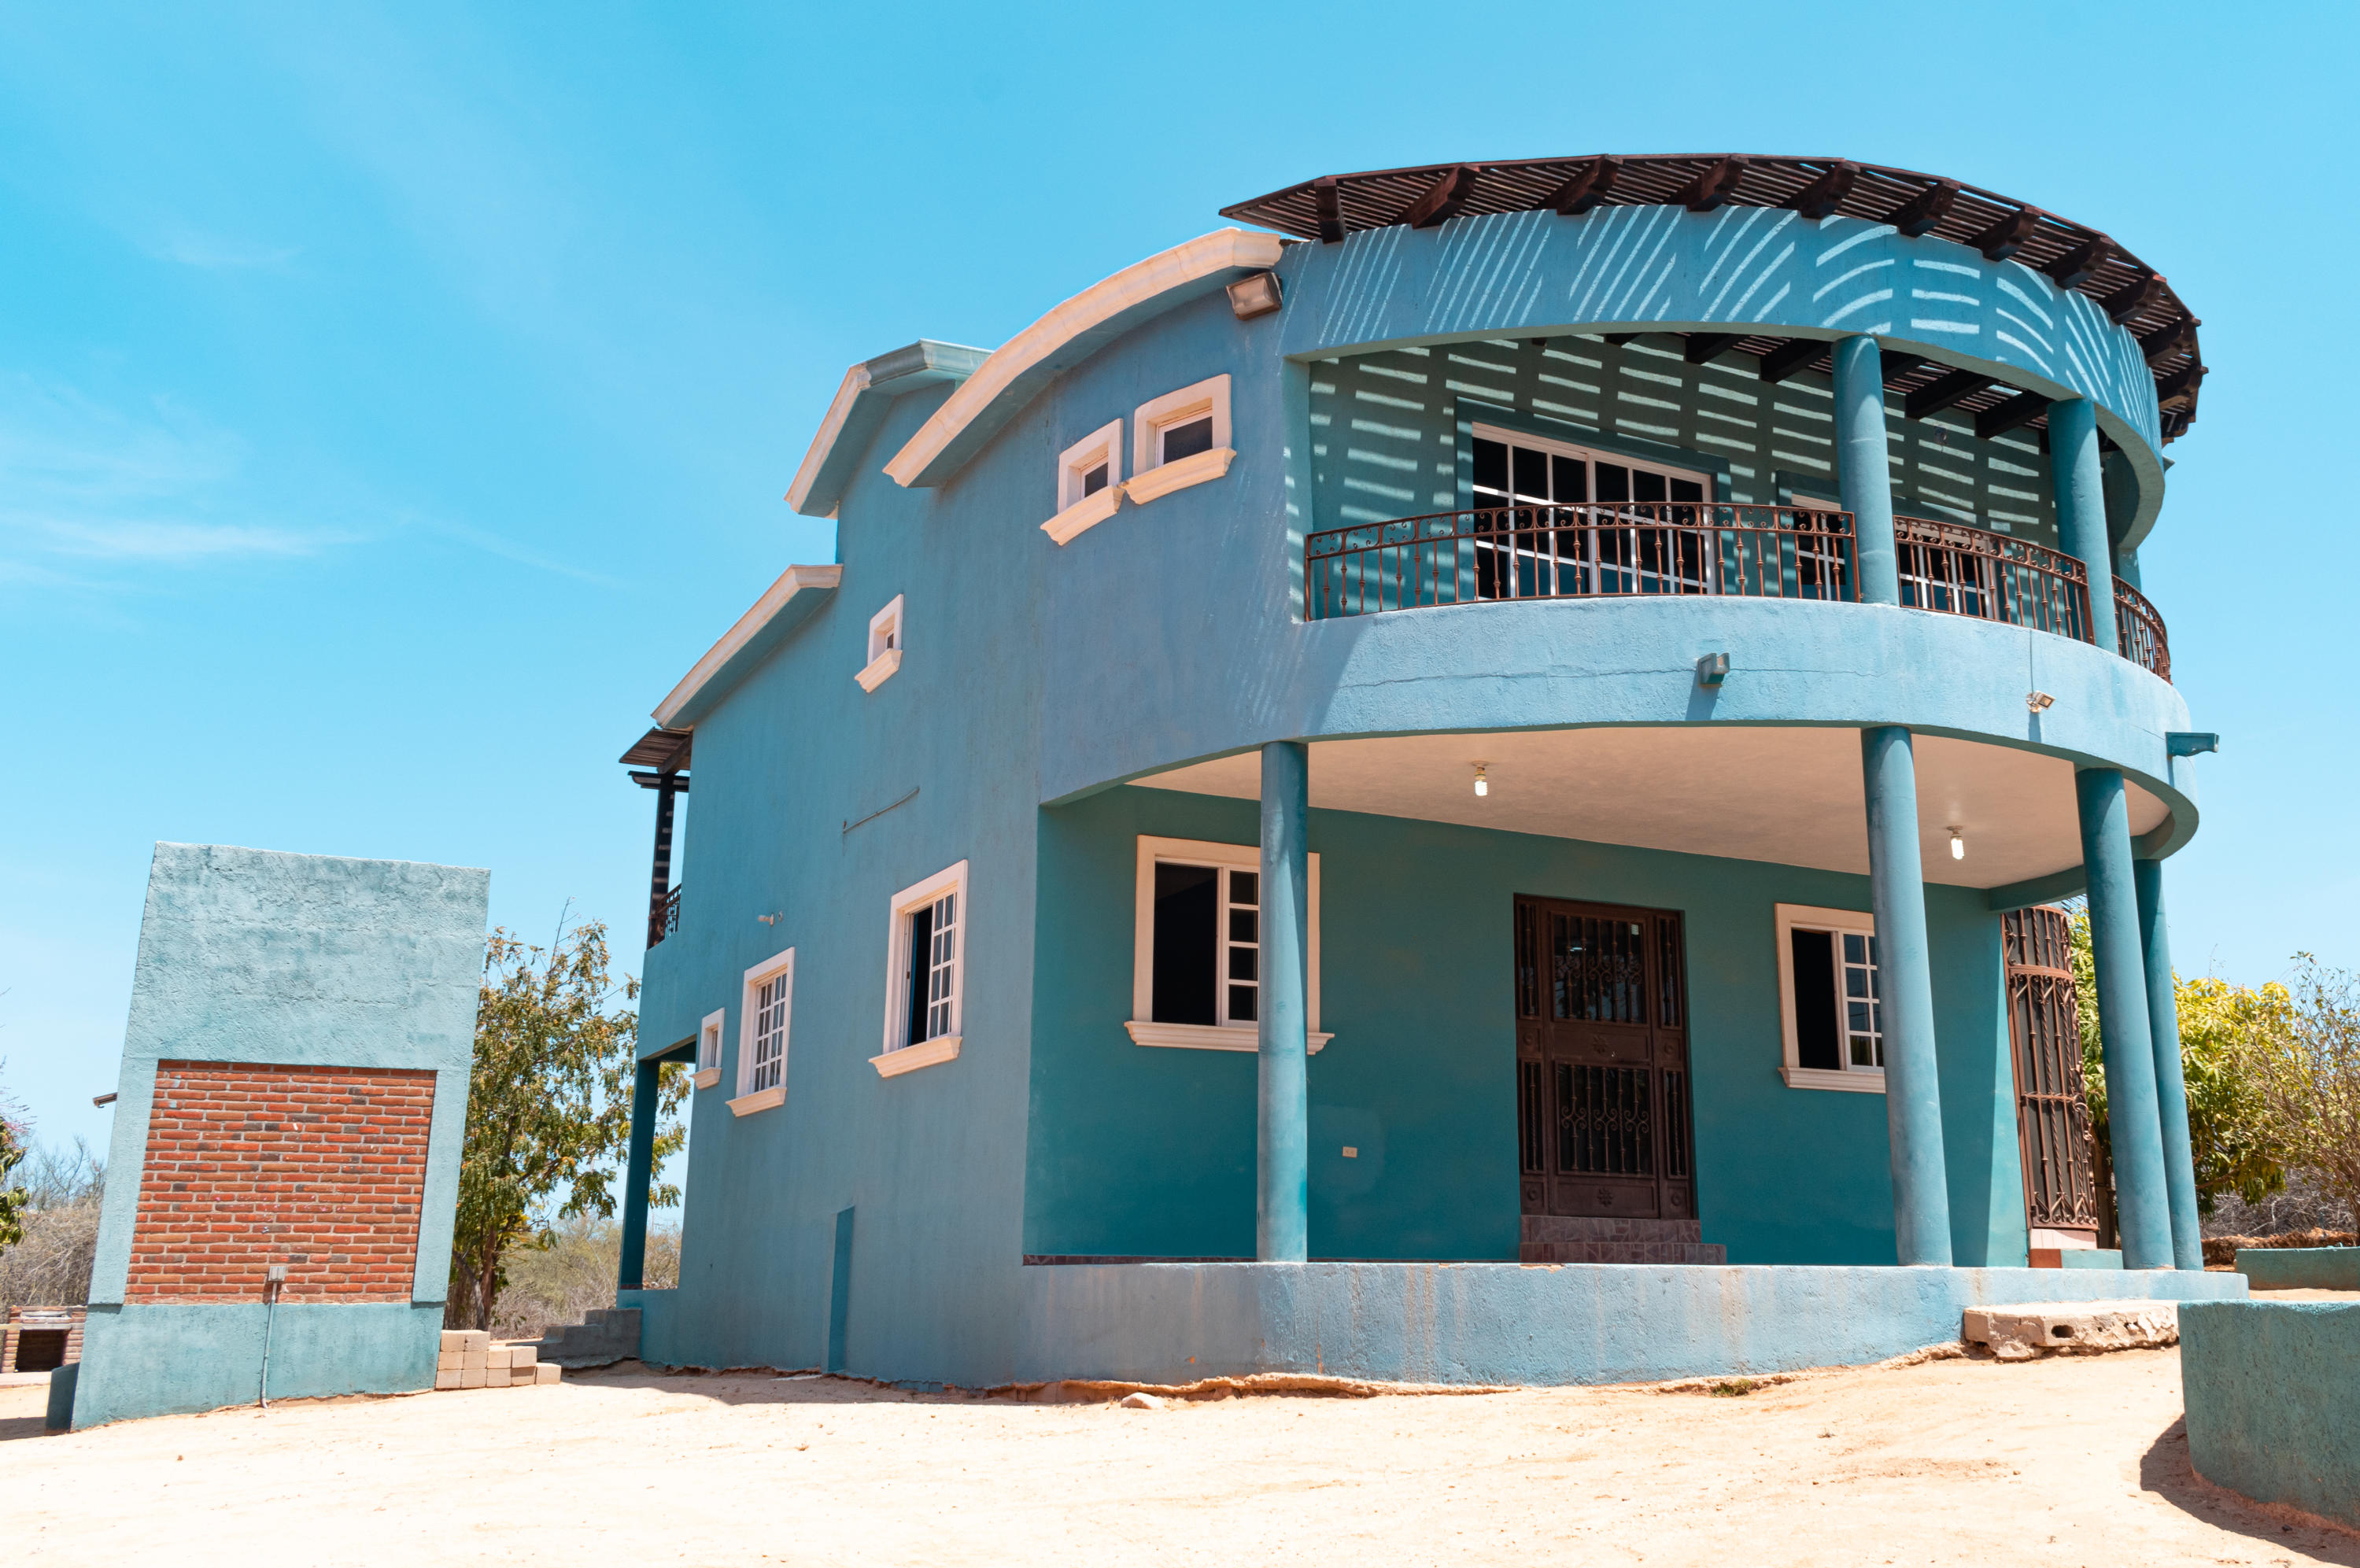 Calle Del Reoyo East Cape